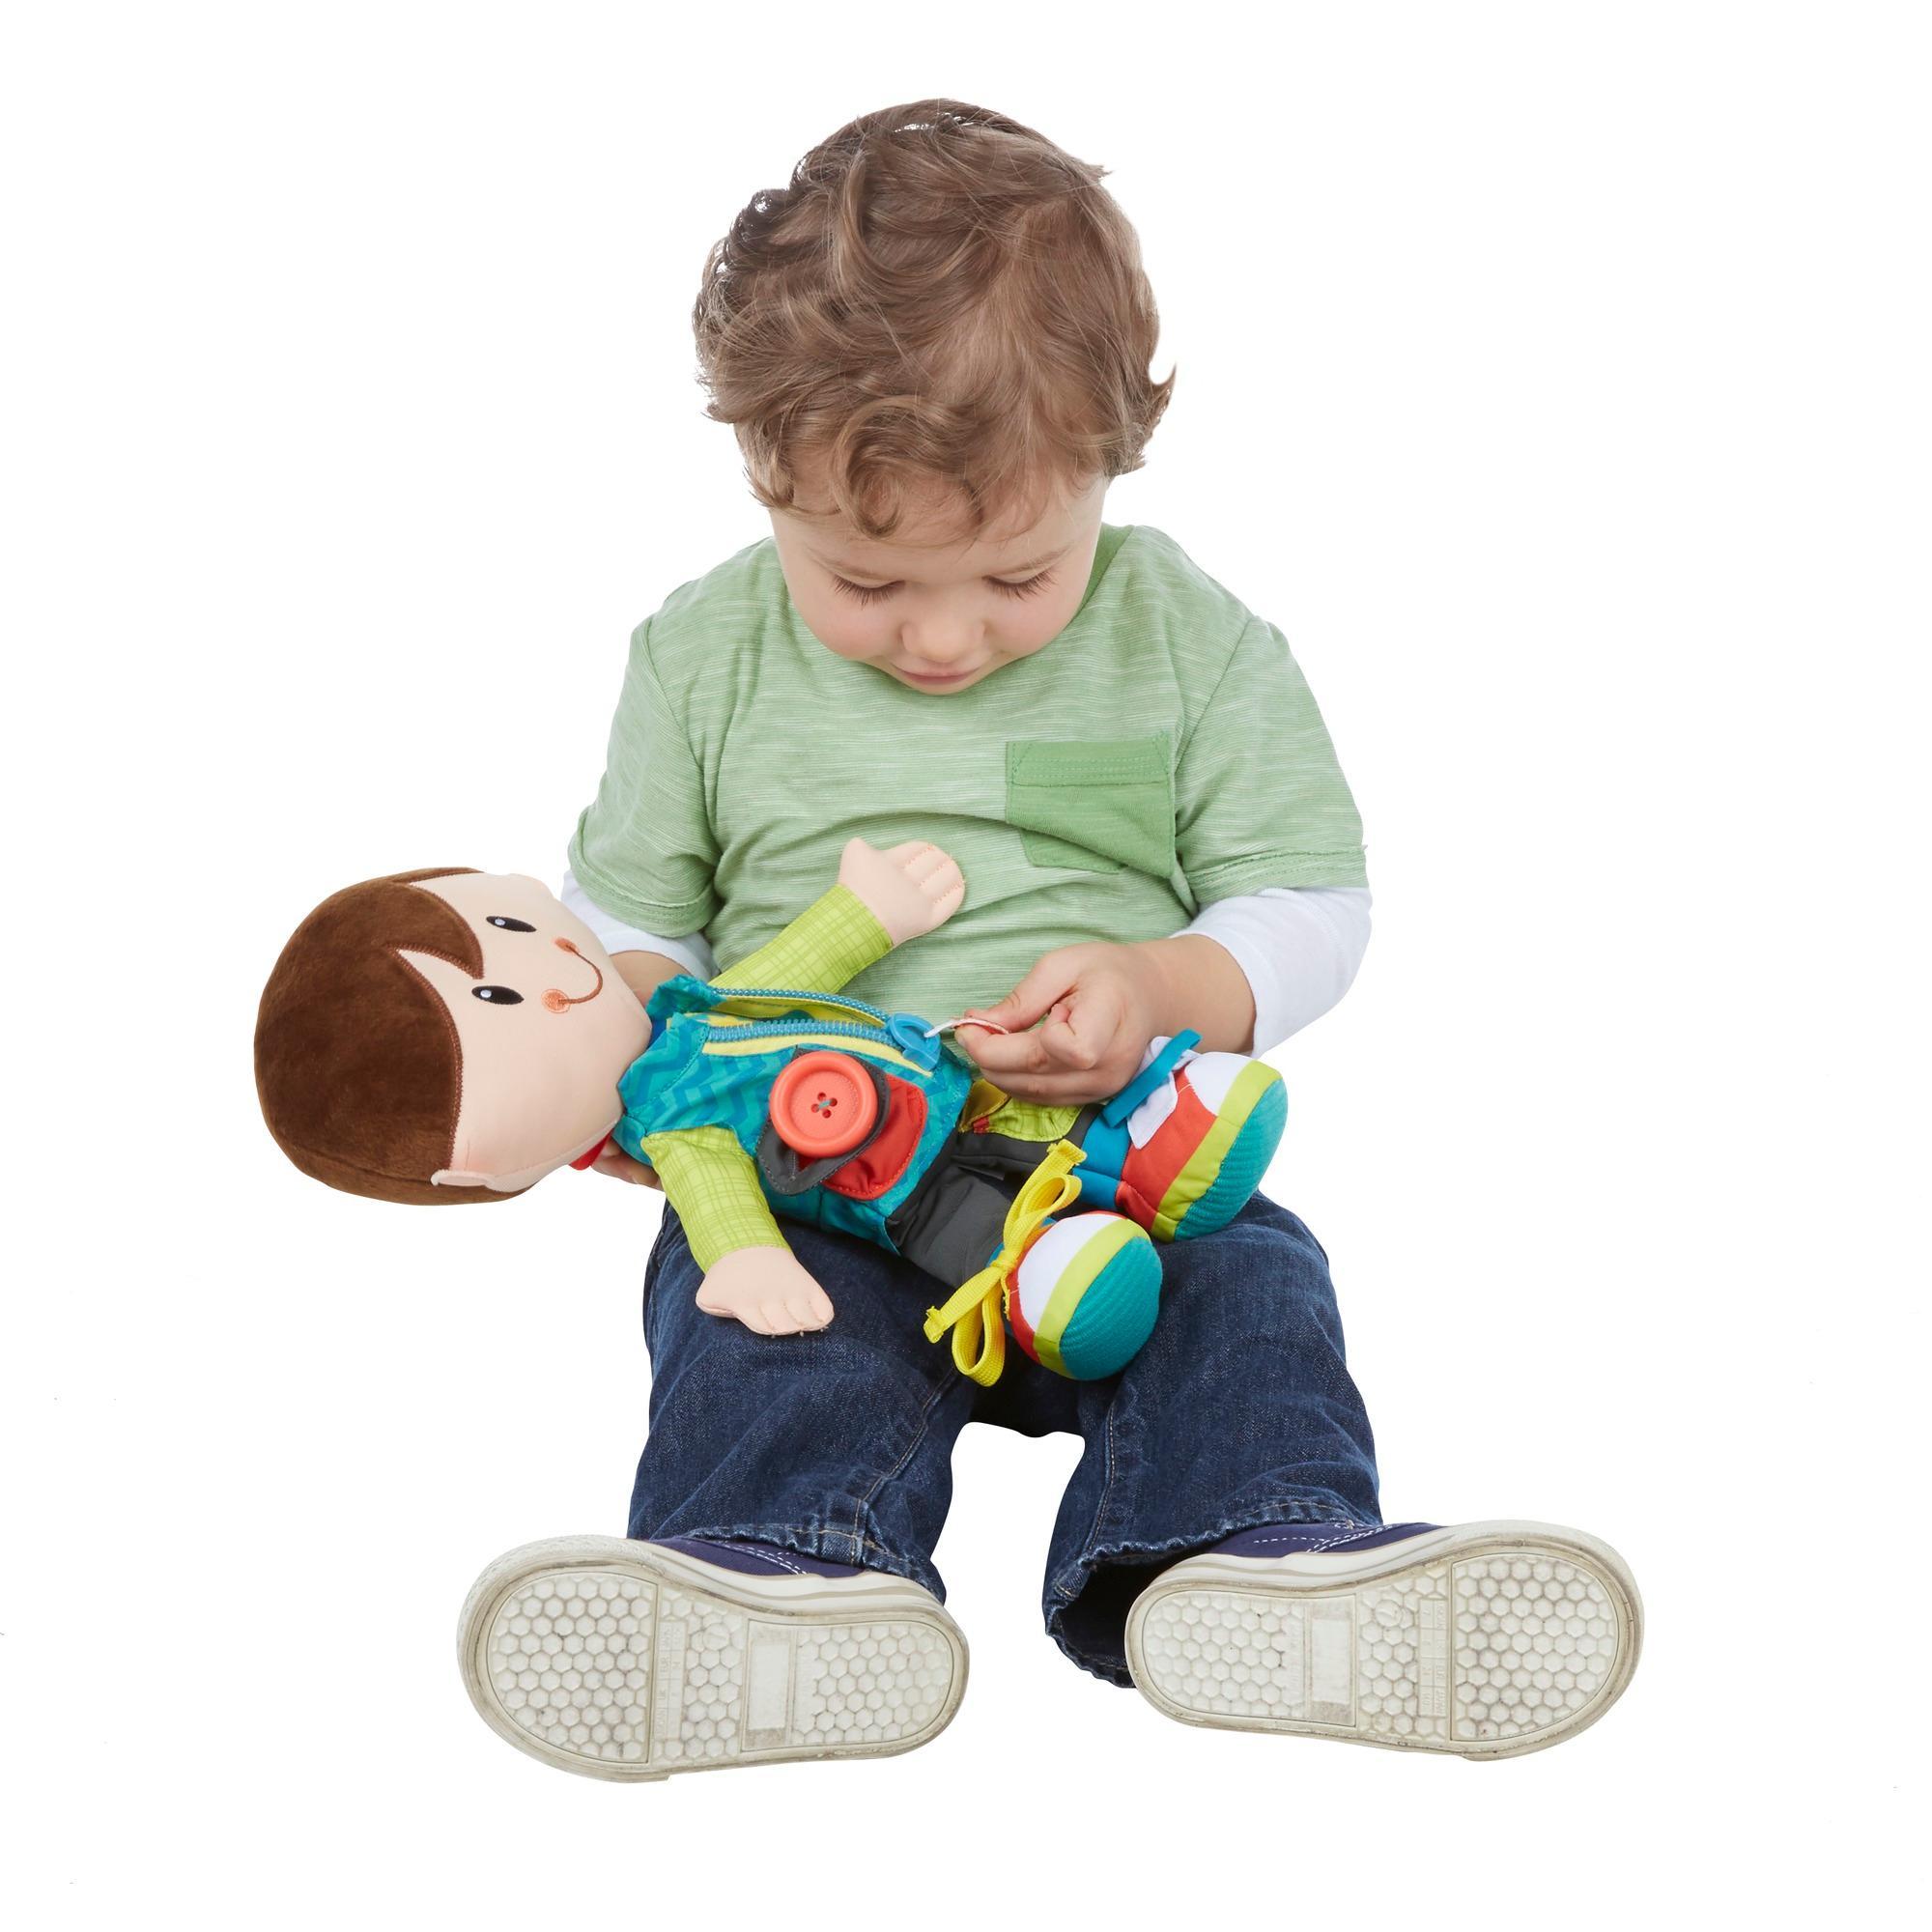 Playskool Dressy Kids Boy Amazon Toys & Games